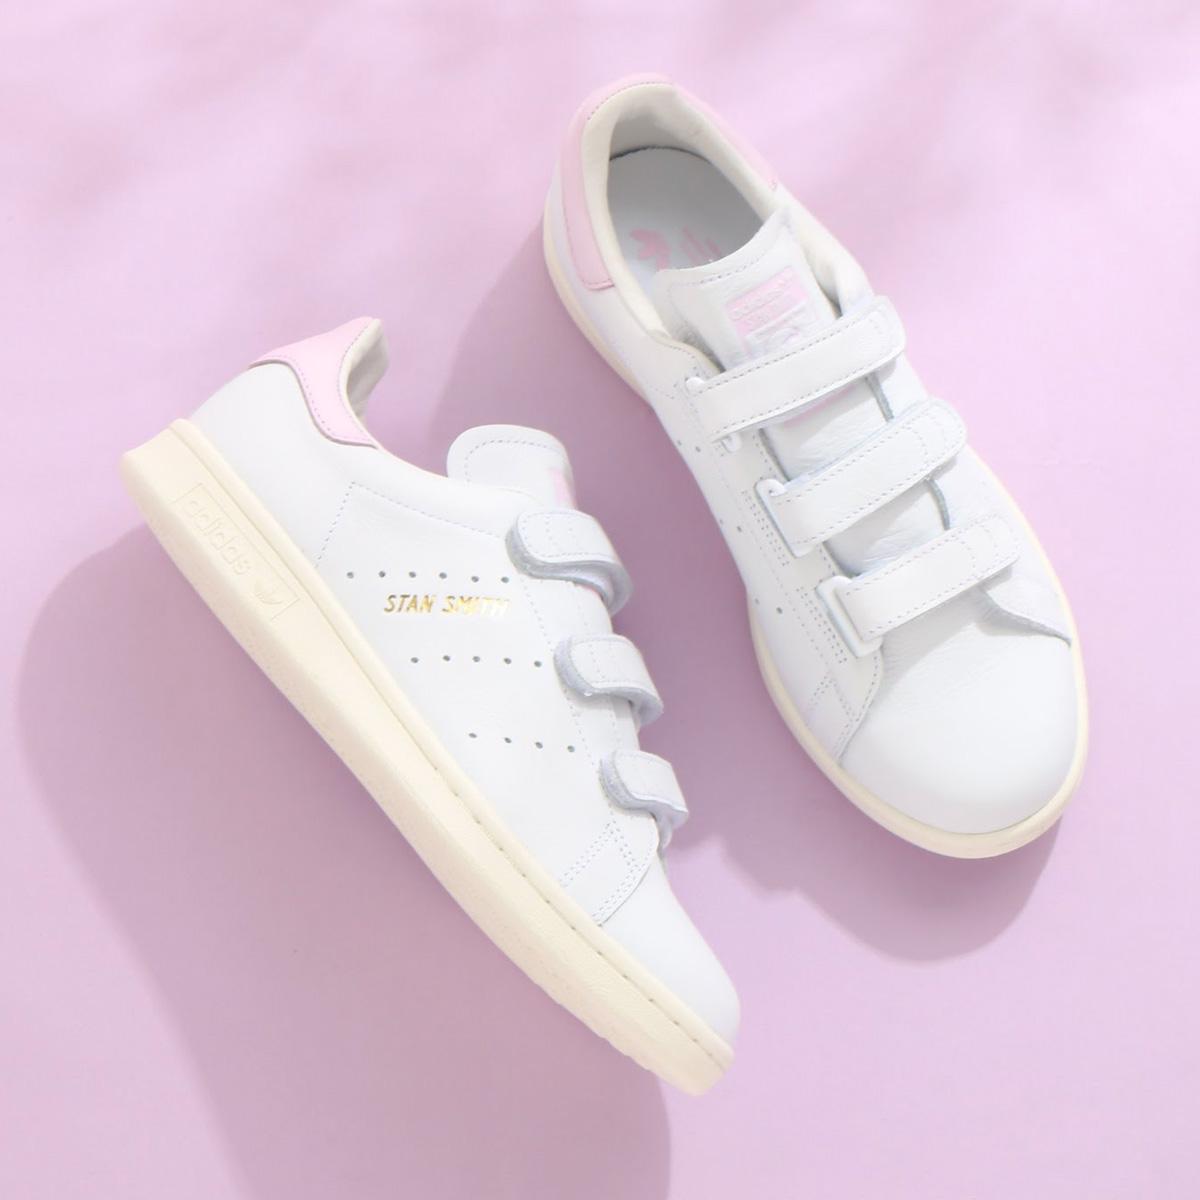 00f1a2893 adidas Originals STAN SMITH CF(アディダス オリジナルス スタンスミス CF)Running White Running  White Aero Pink18SS-I ☆10・お取り寄せ商品☆